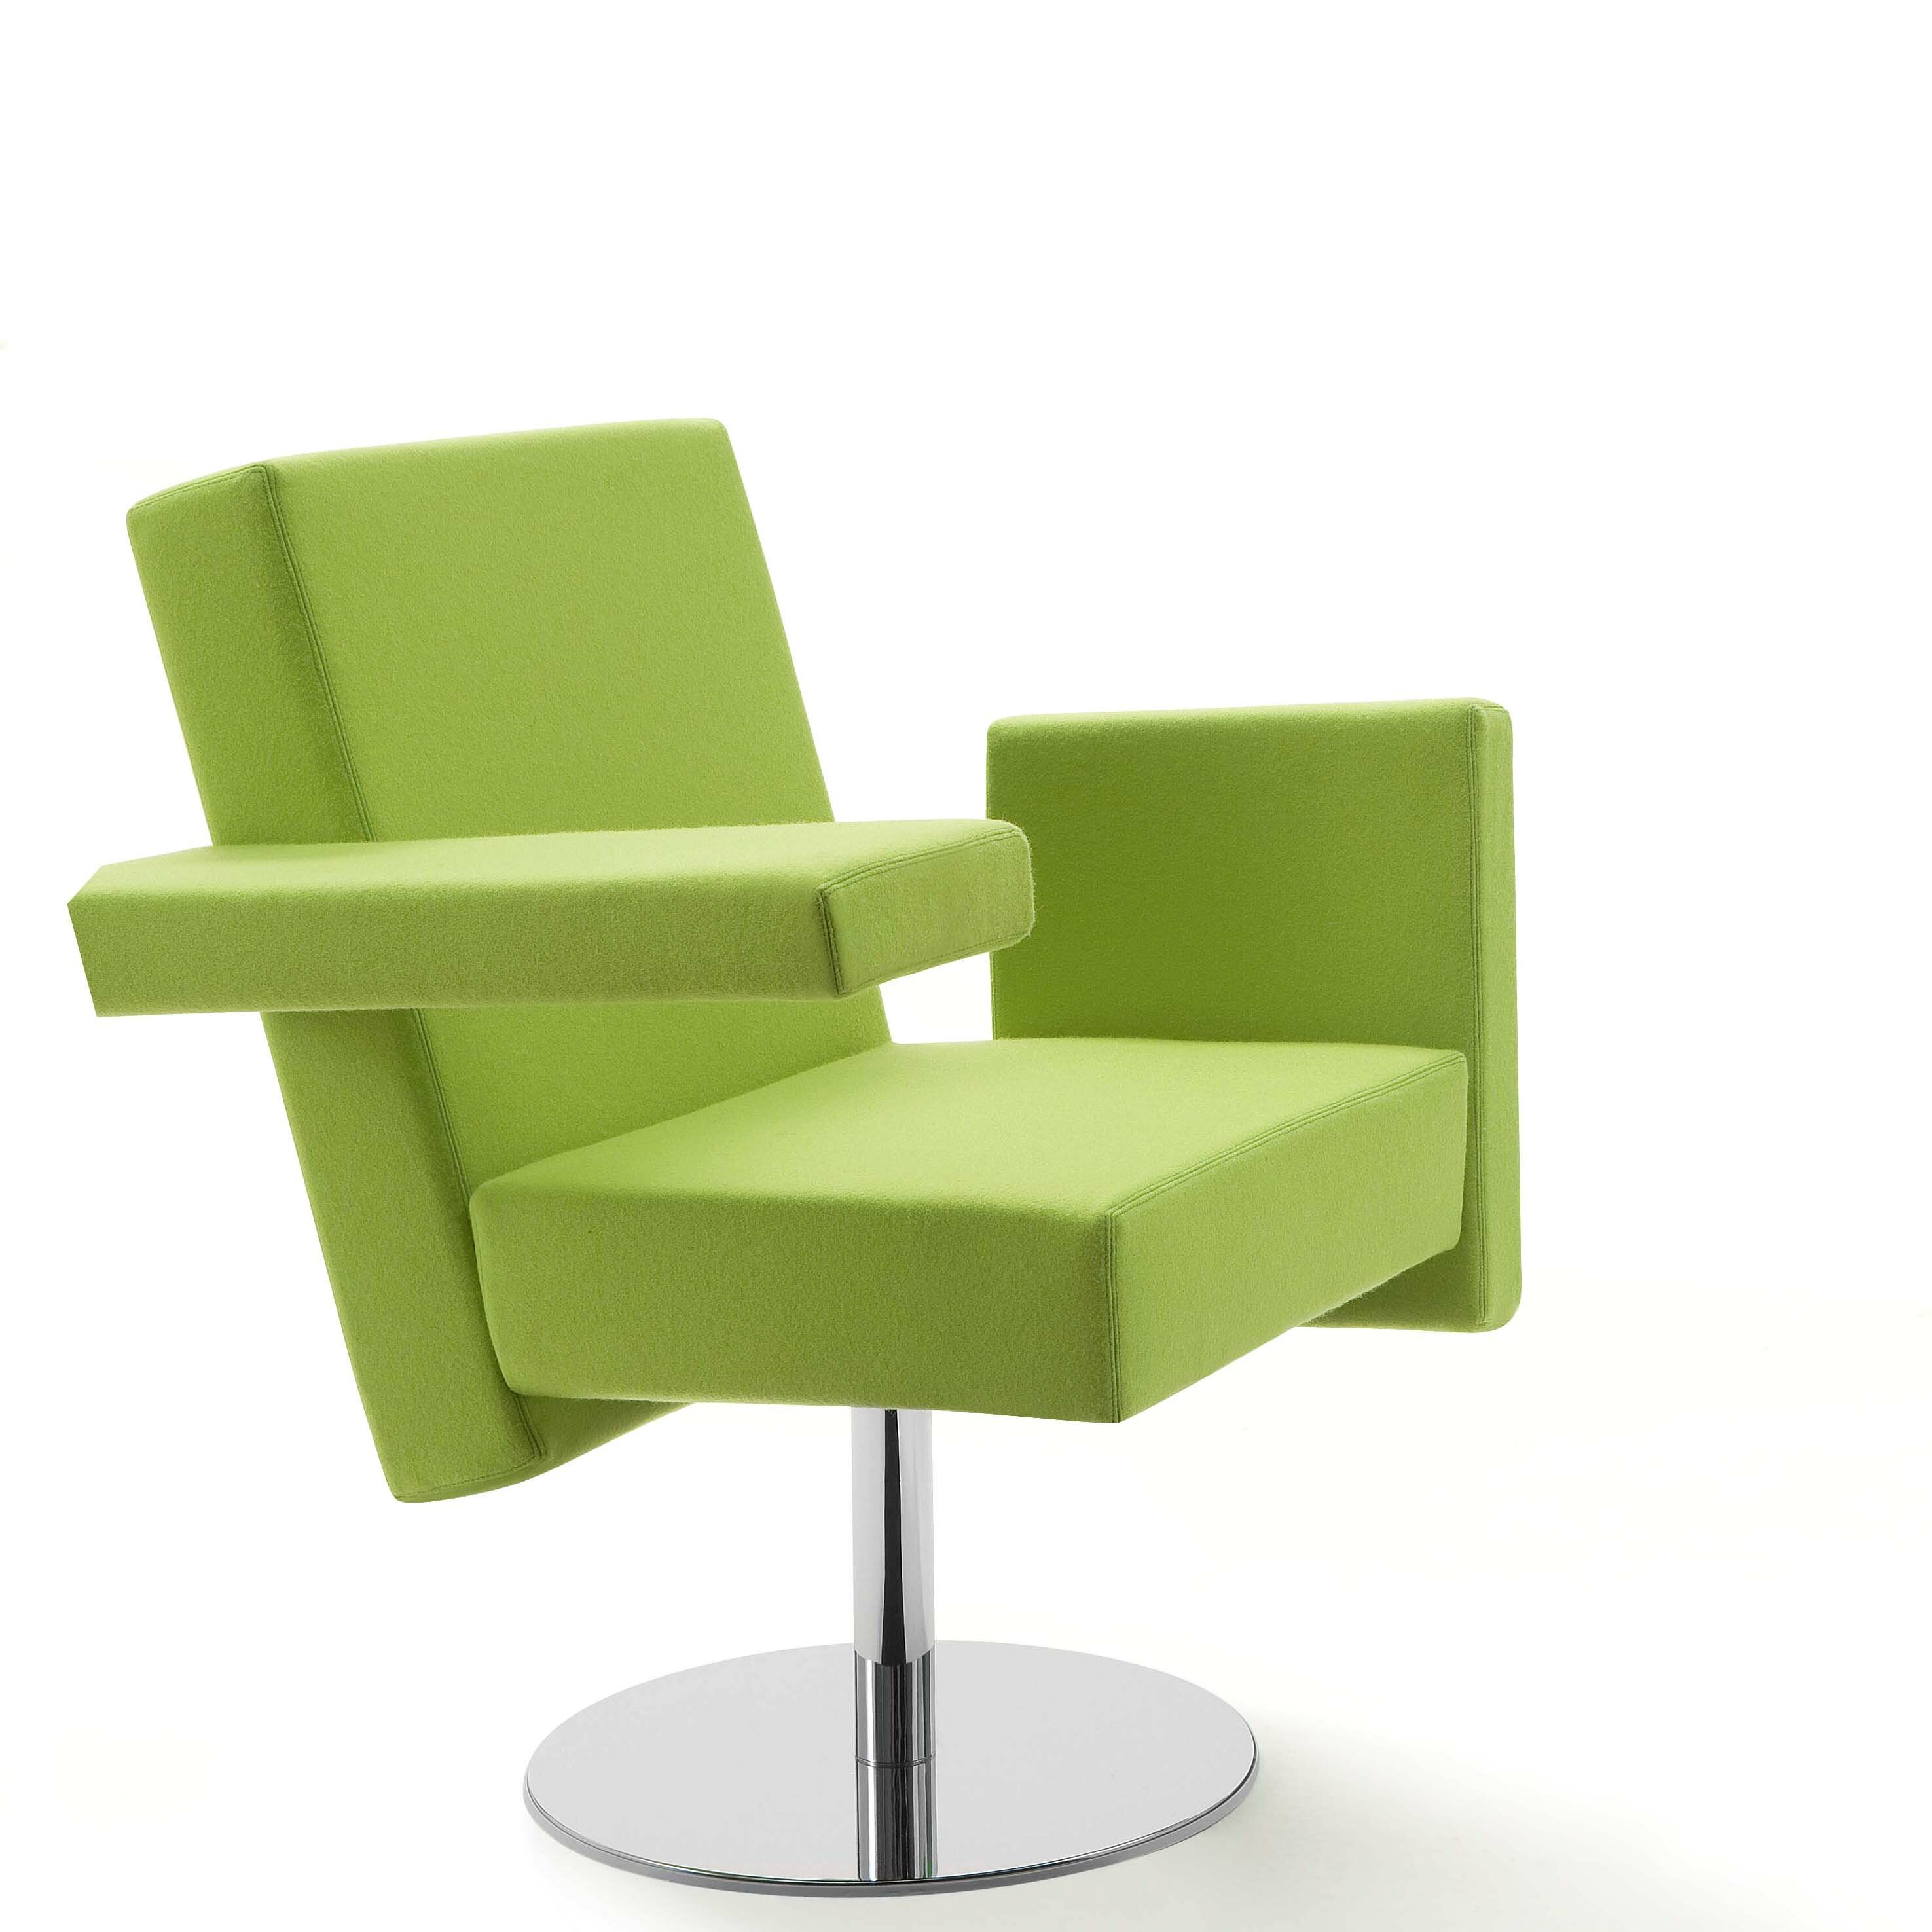 Pleasing Meet Me Swivel Arm Guest Chair Theyellowbook Wood Chair Design Ideas Theyellowbookinfo